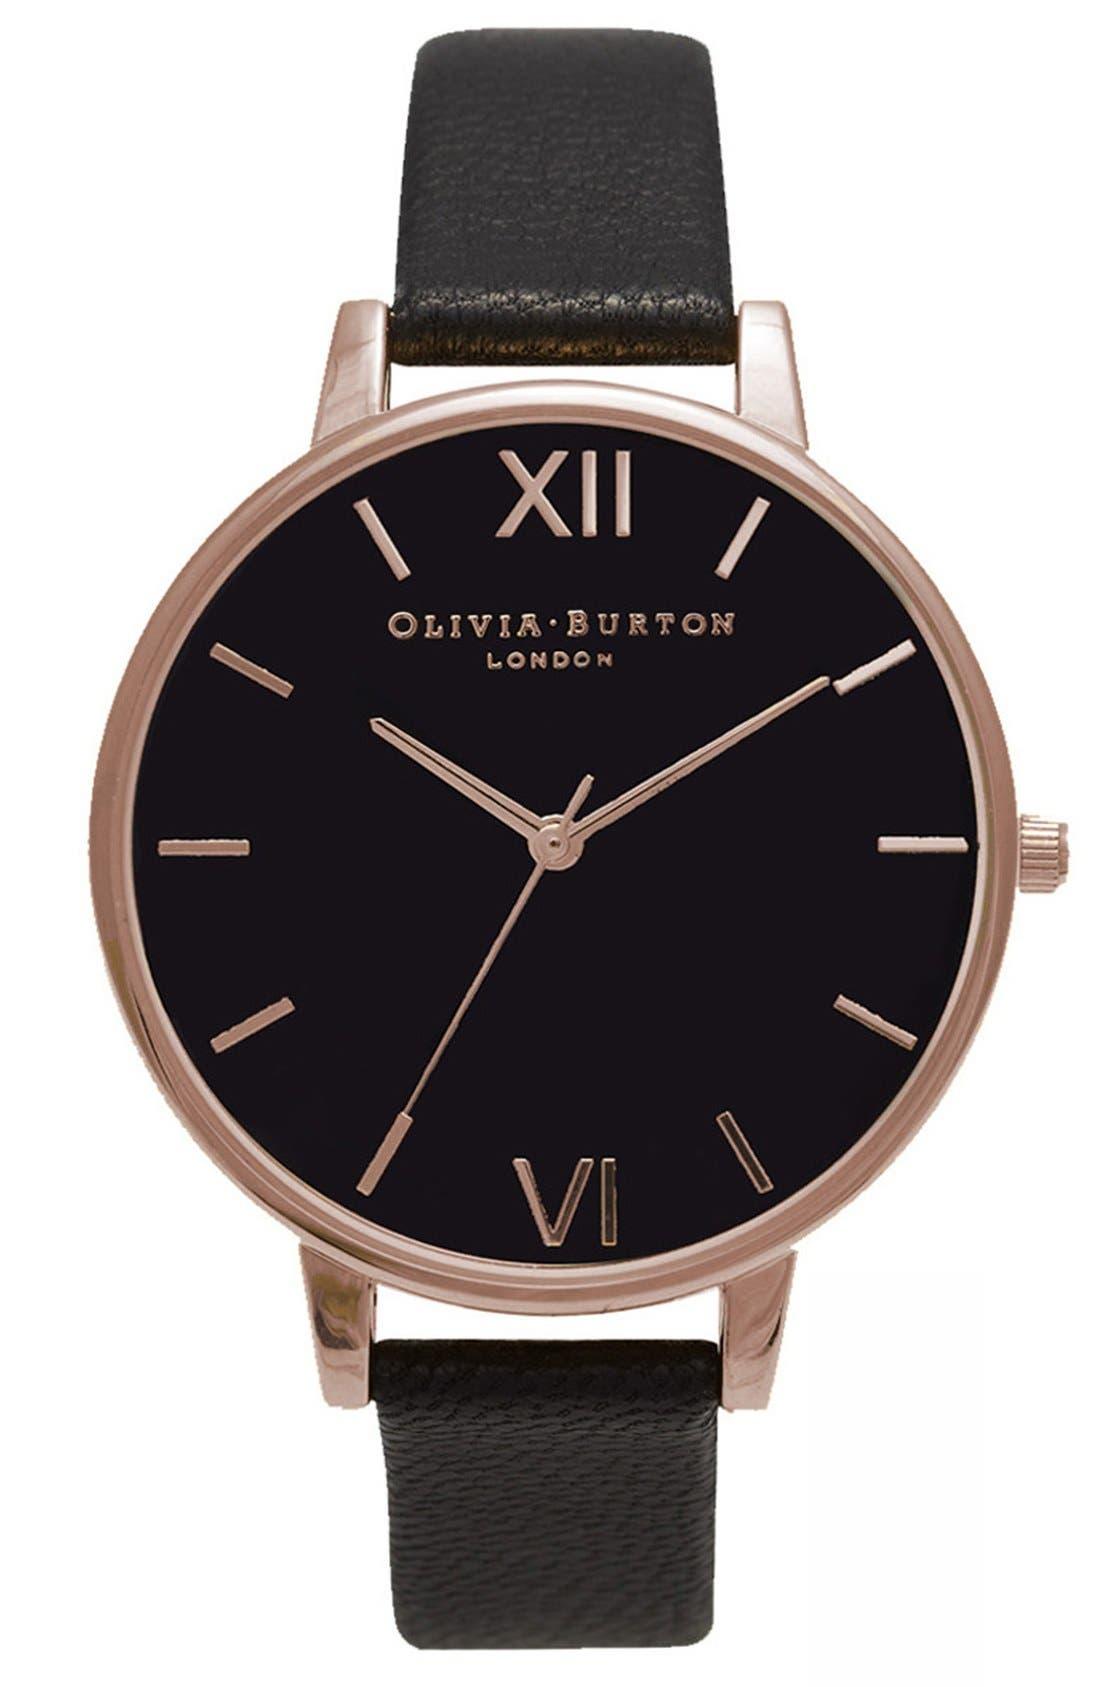 OLIVIA BURTON Big Dial Leather Strap Watch, 38mm, Main, color, BLACK/ BLACK/ ROSE GOLD